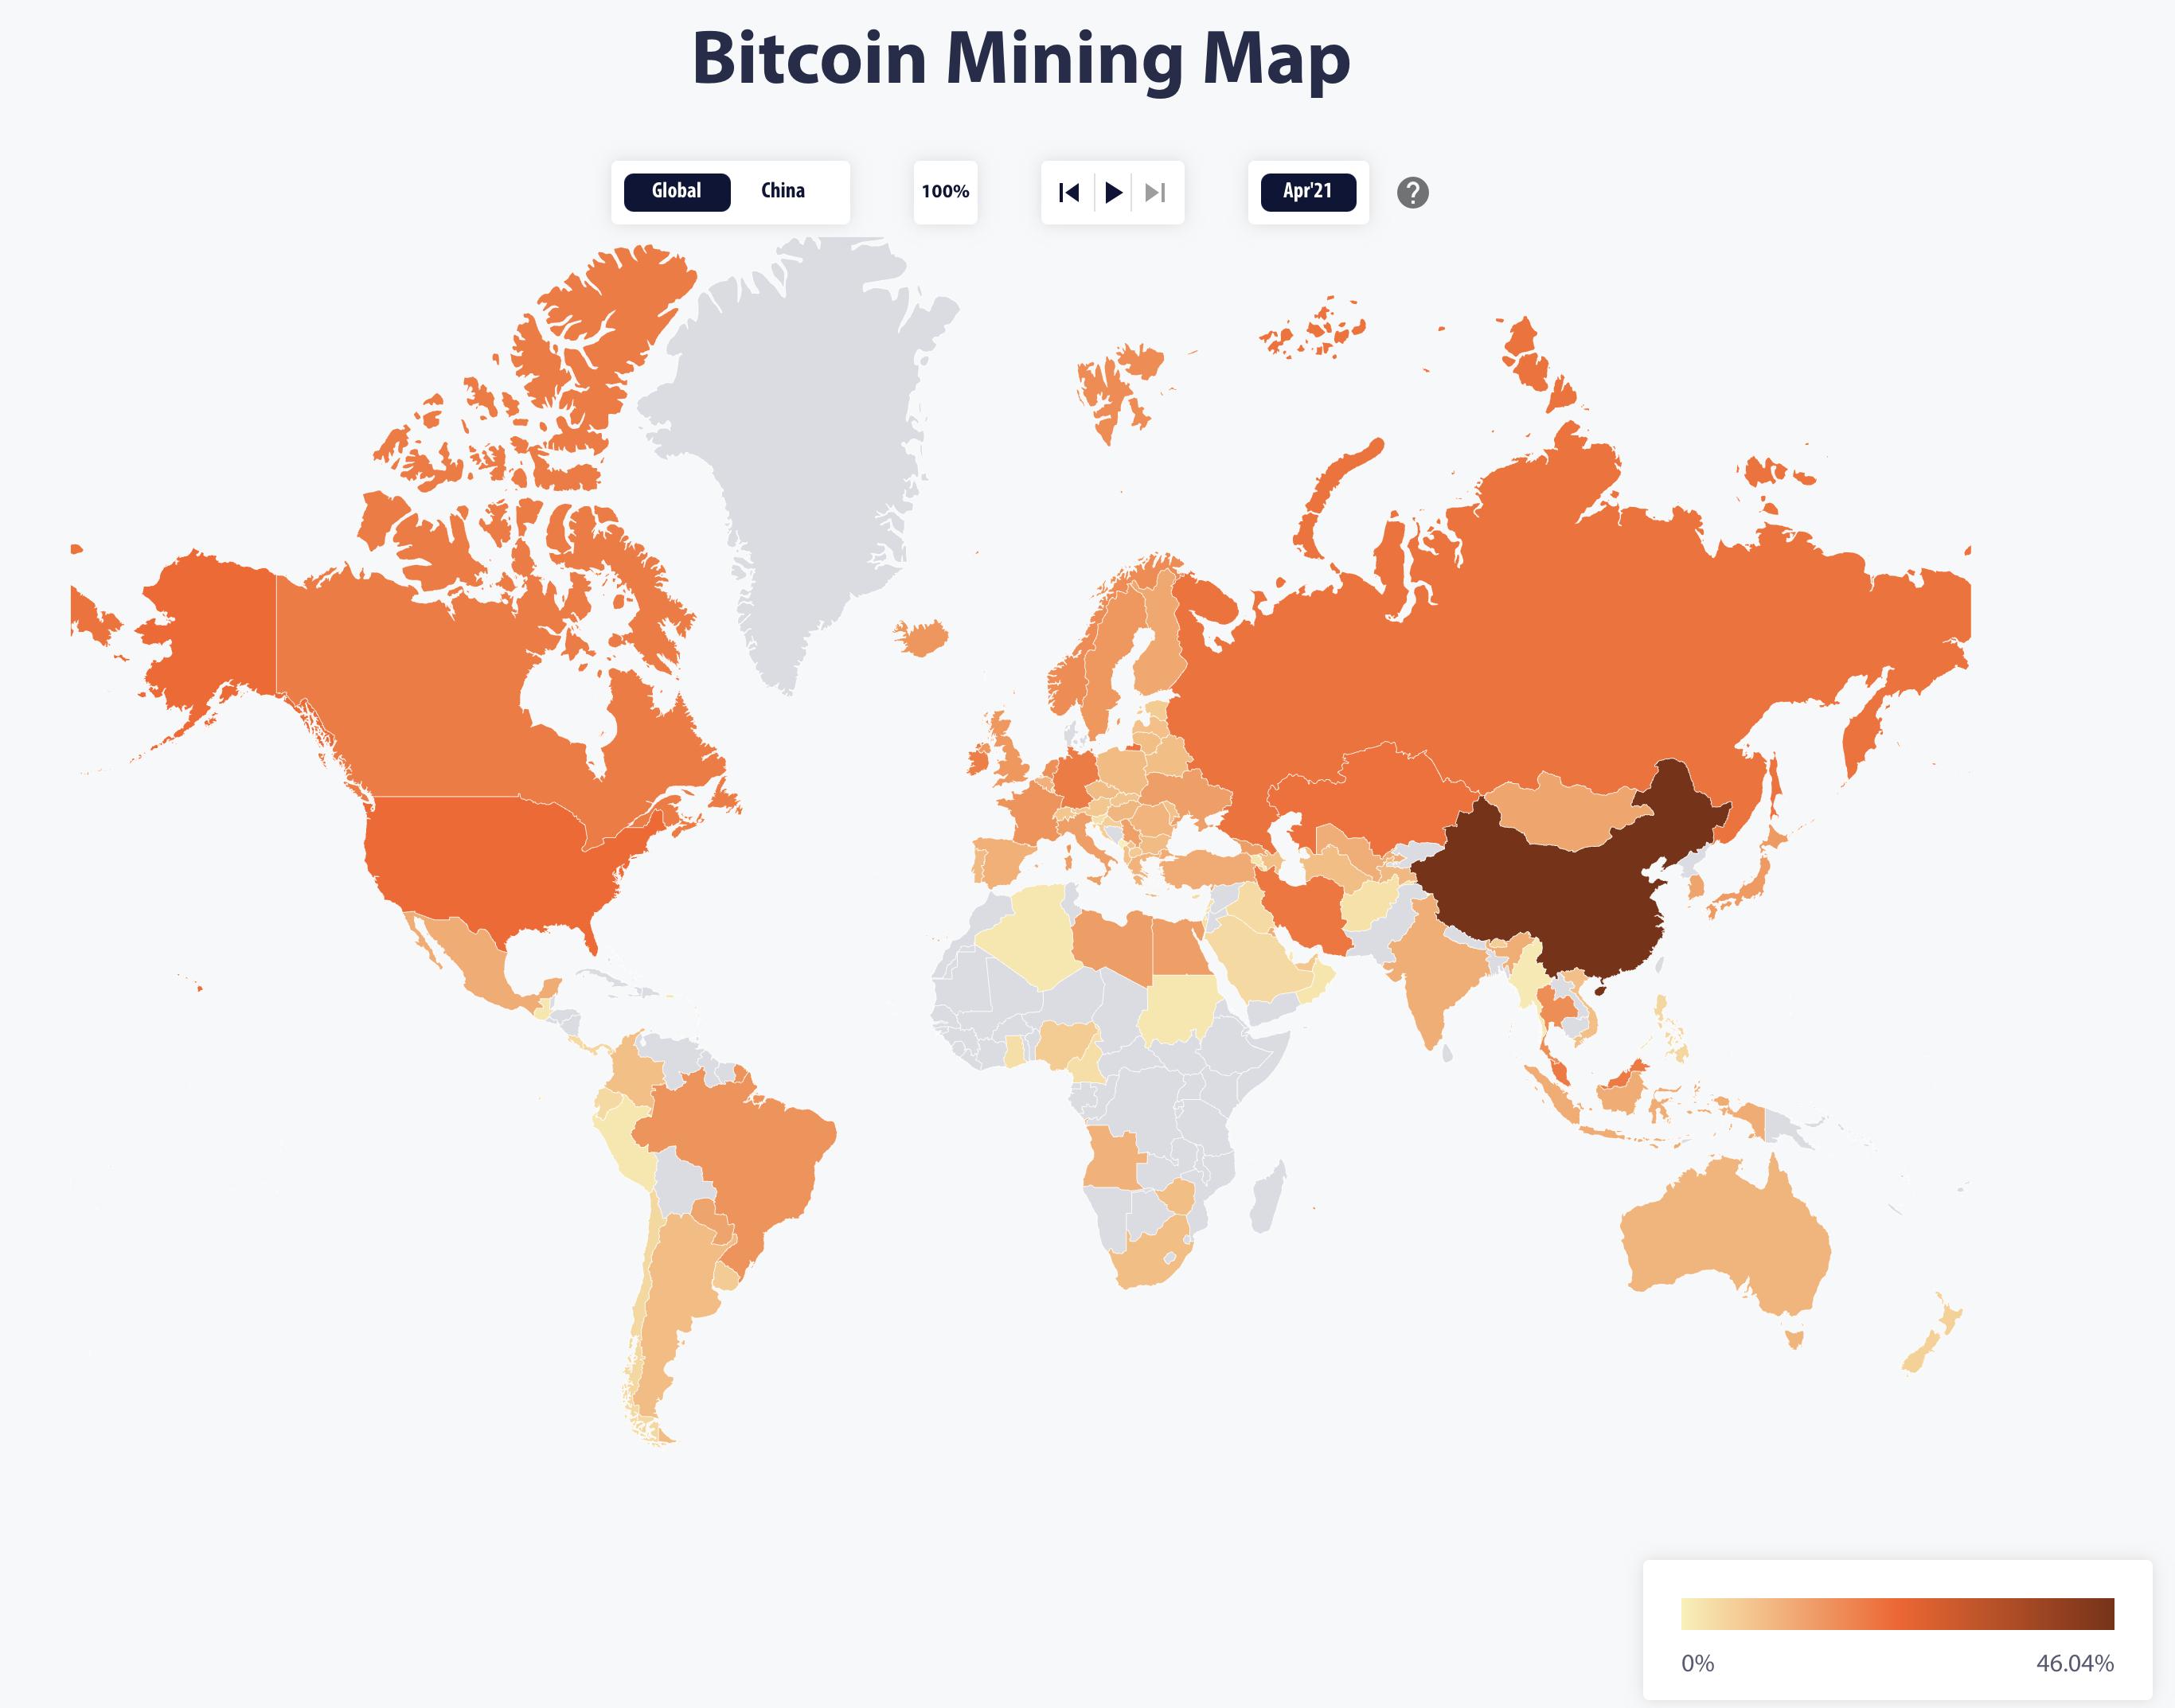 Worldwide Bitcoin Electricity Consumption Index April 2021: Cambridge Centre of Alternative Finance